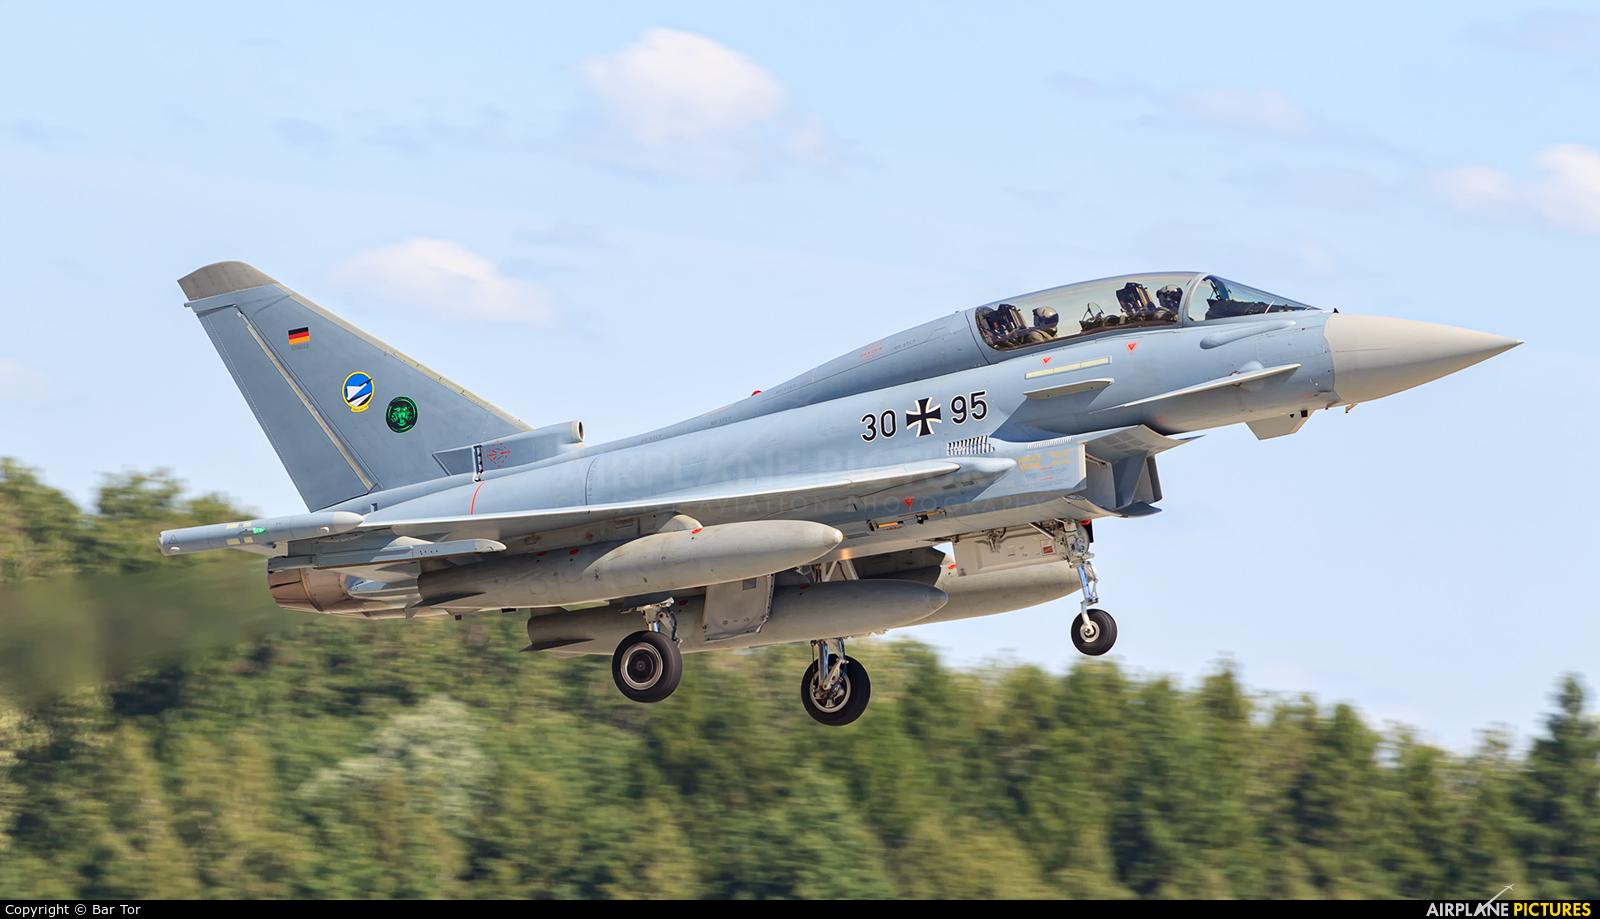 Germany - Air Force 30+95 aircraft at Poznań - Krzesiny